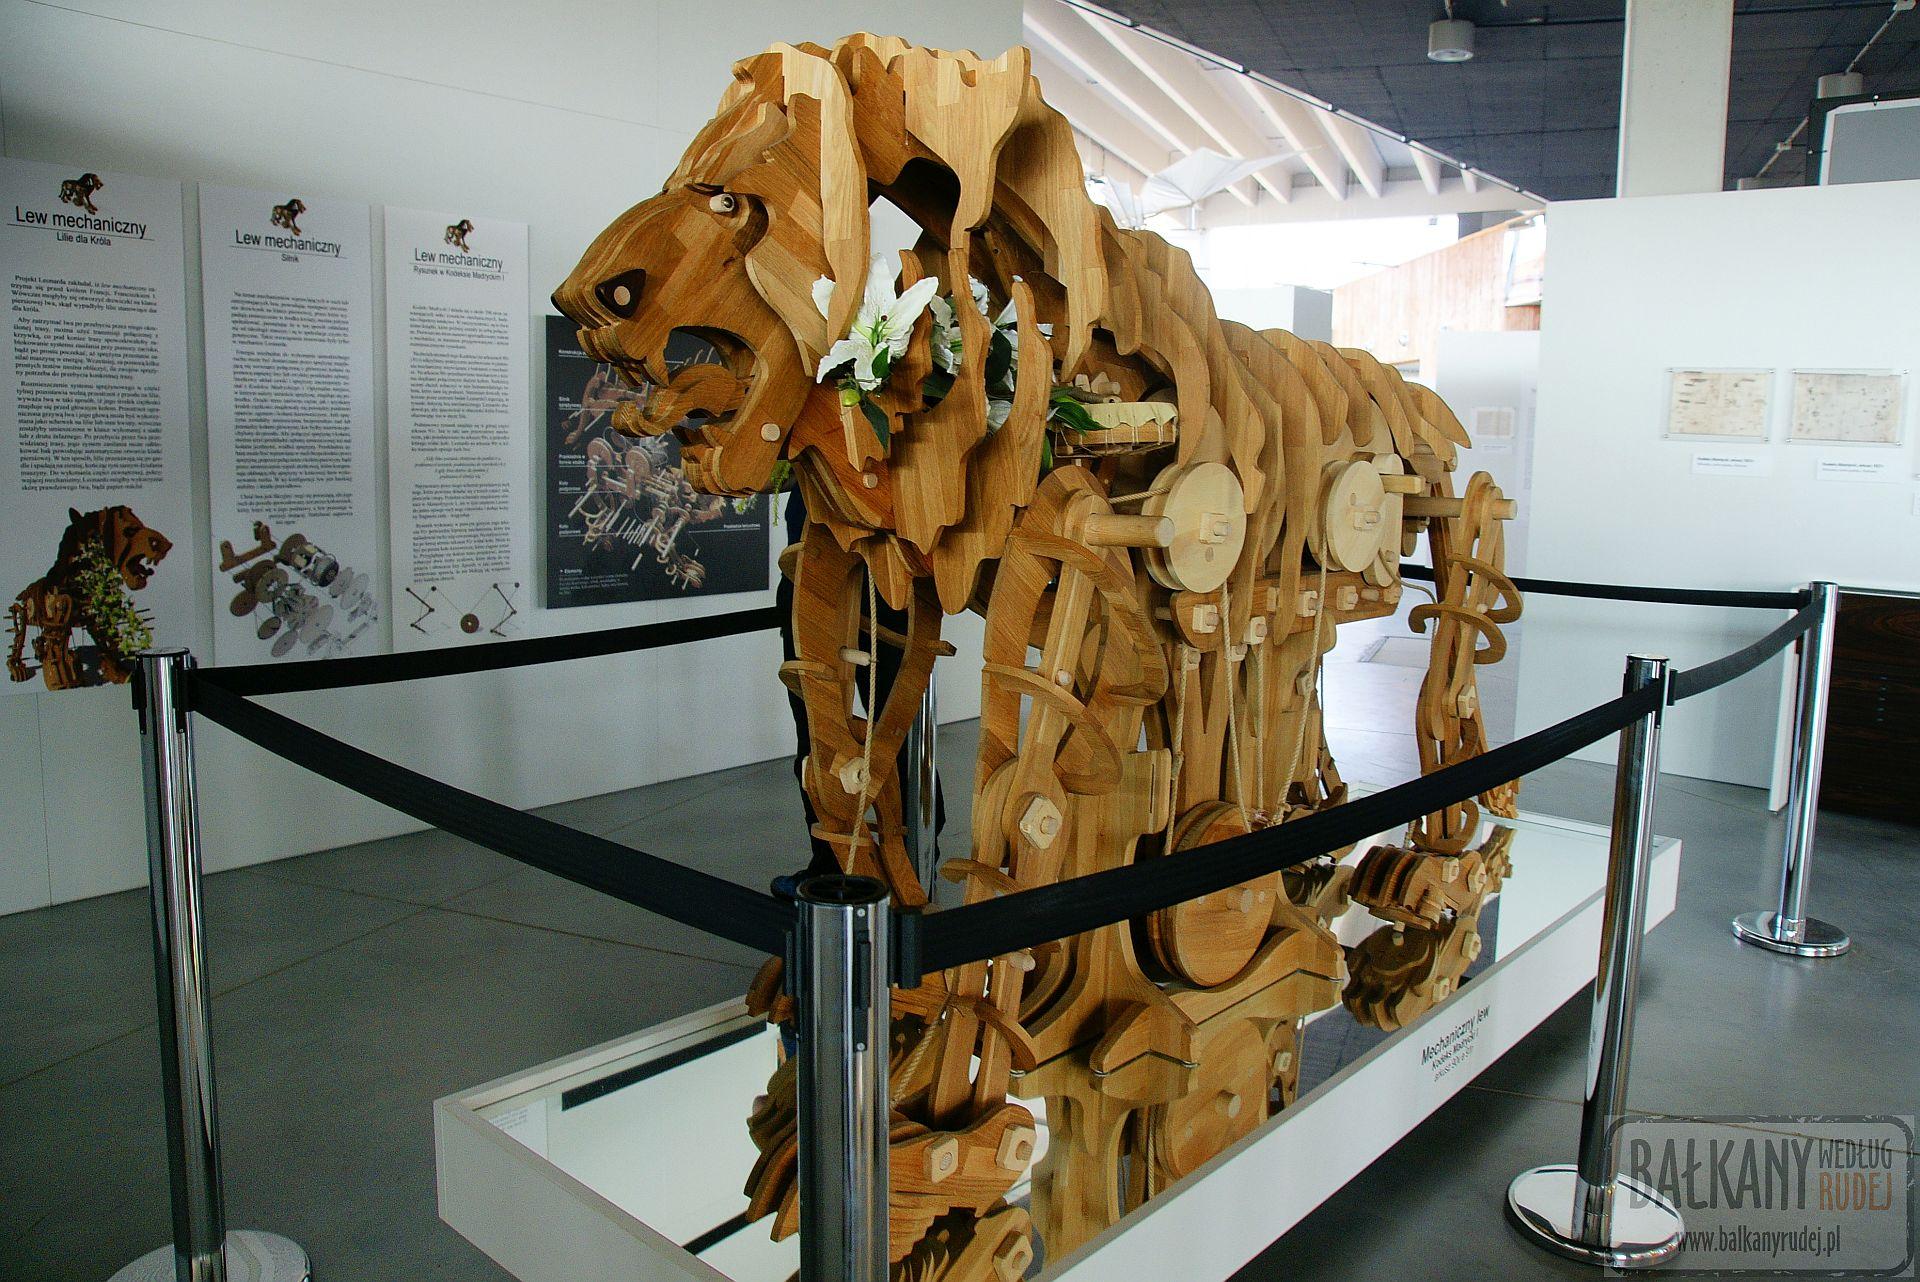 Lew mechaniczny